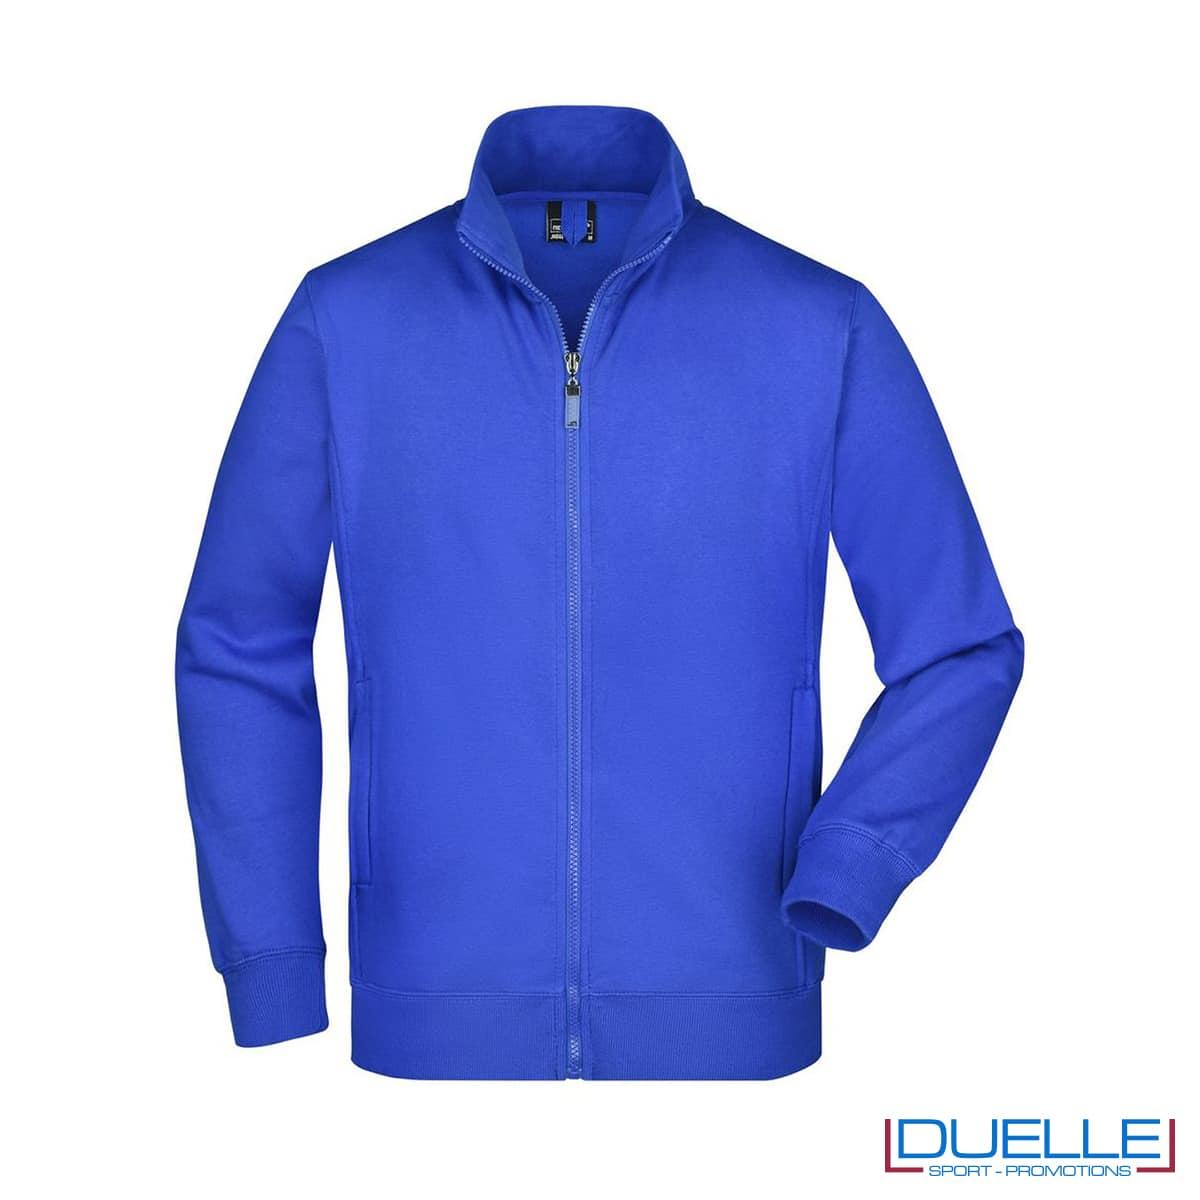 felpa blu royal da uomo resistente lavaggi intensivi con zip